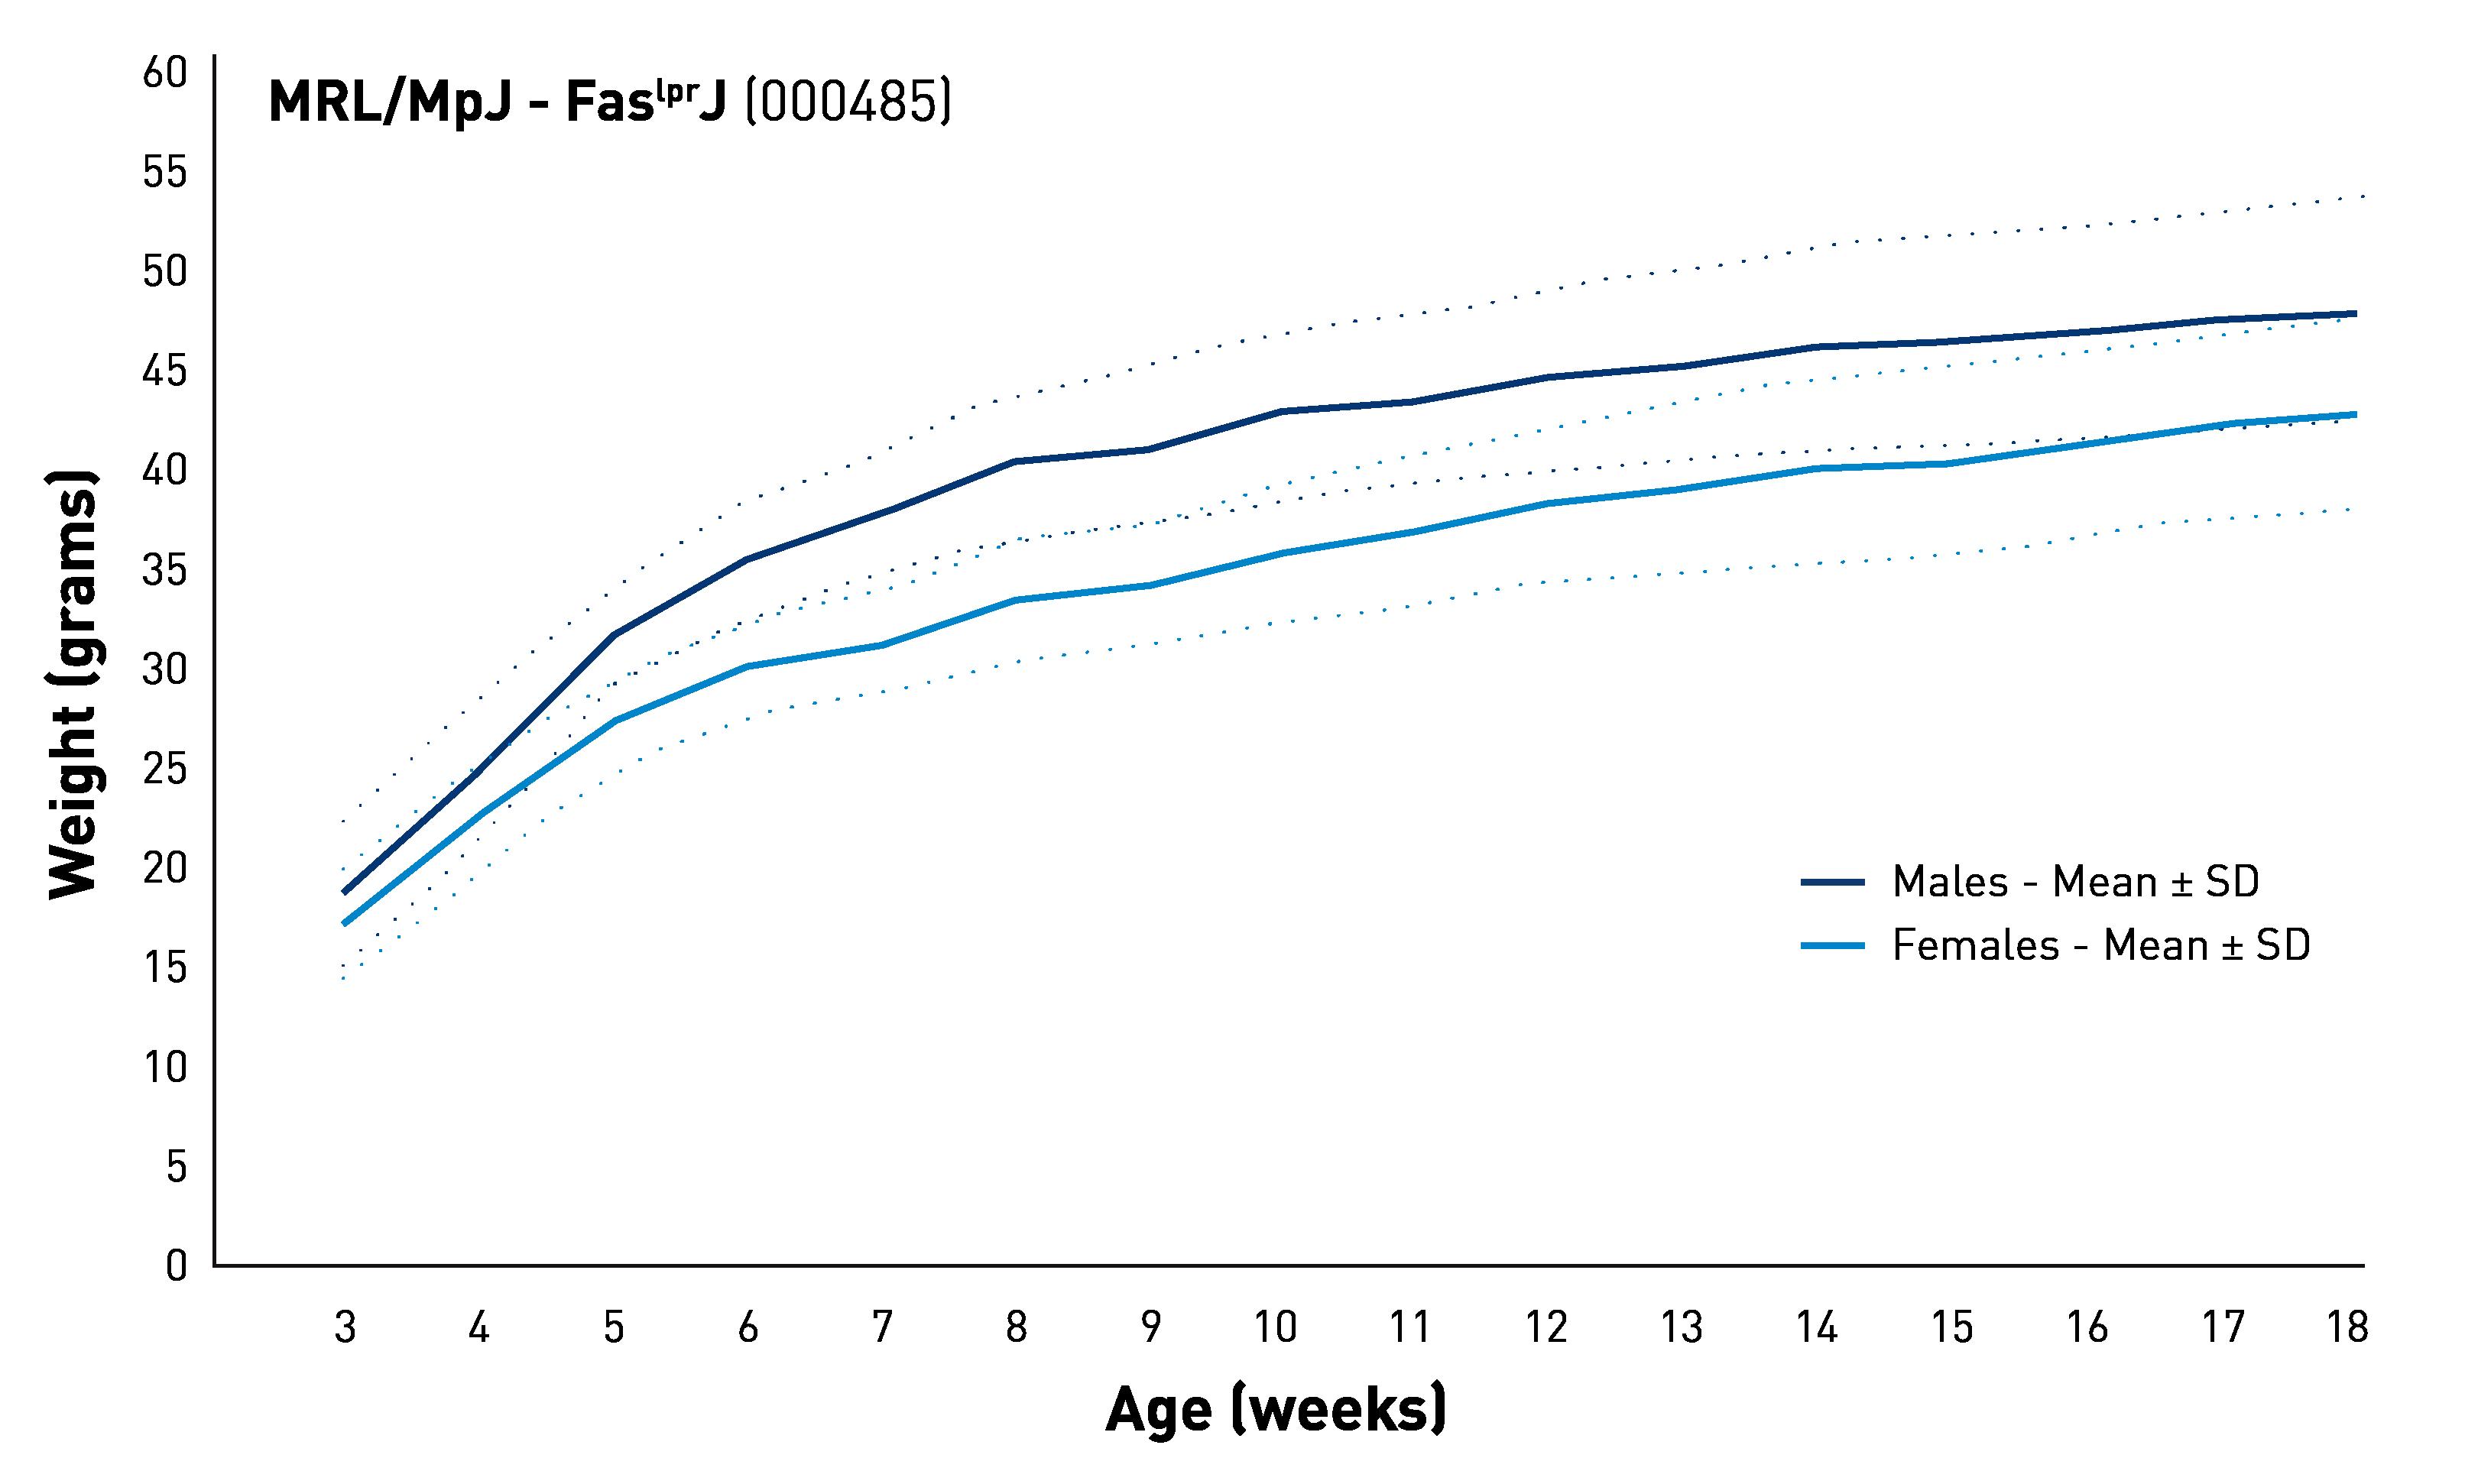 Body Weight Information - JAX<sup>&reg;</sup> Mice Strain - MRL/MpJ-<i>Fas<sup>lpr</sup></i>/J (000485)